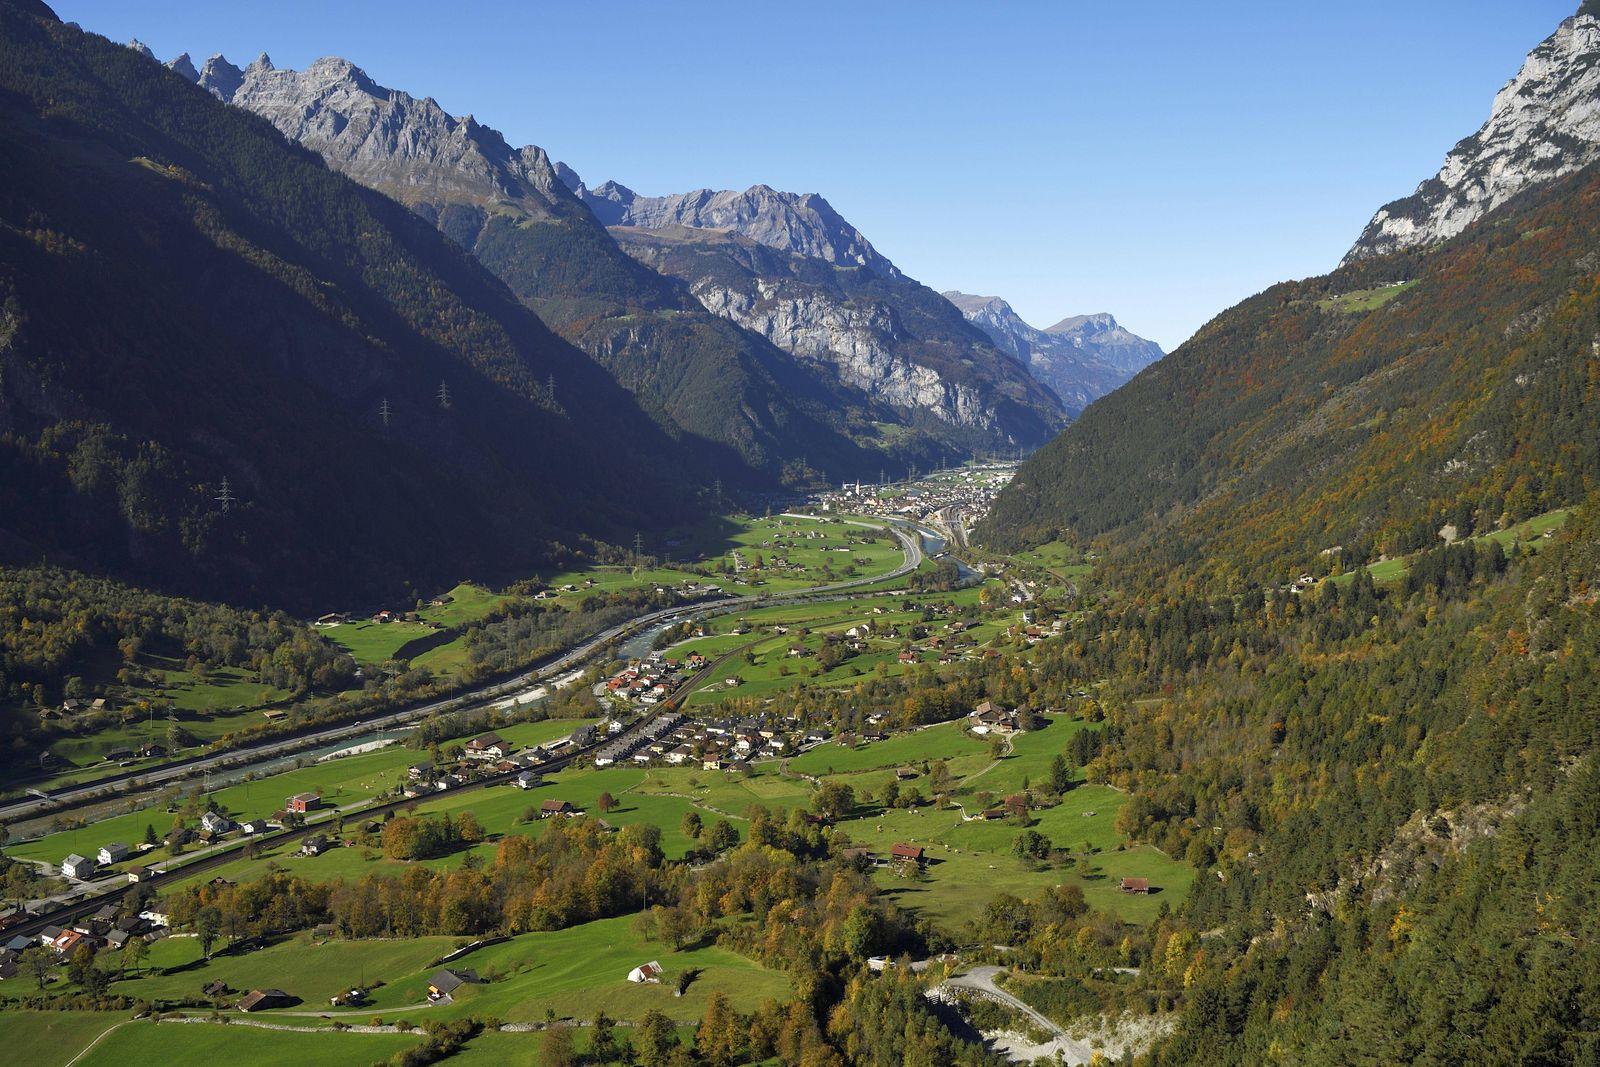 Urner Reusstal mit Fluss Reuss hinten Erstfeld Silenen Kanton Uri Schweiz Europa *** Urner Reus